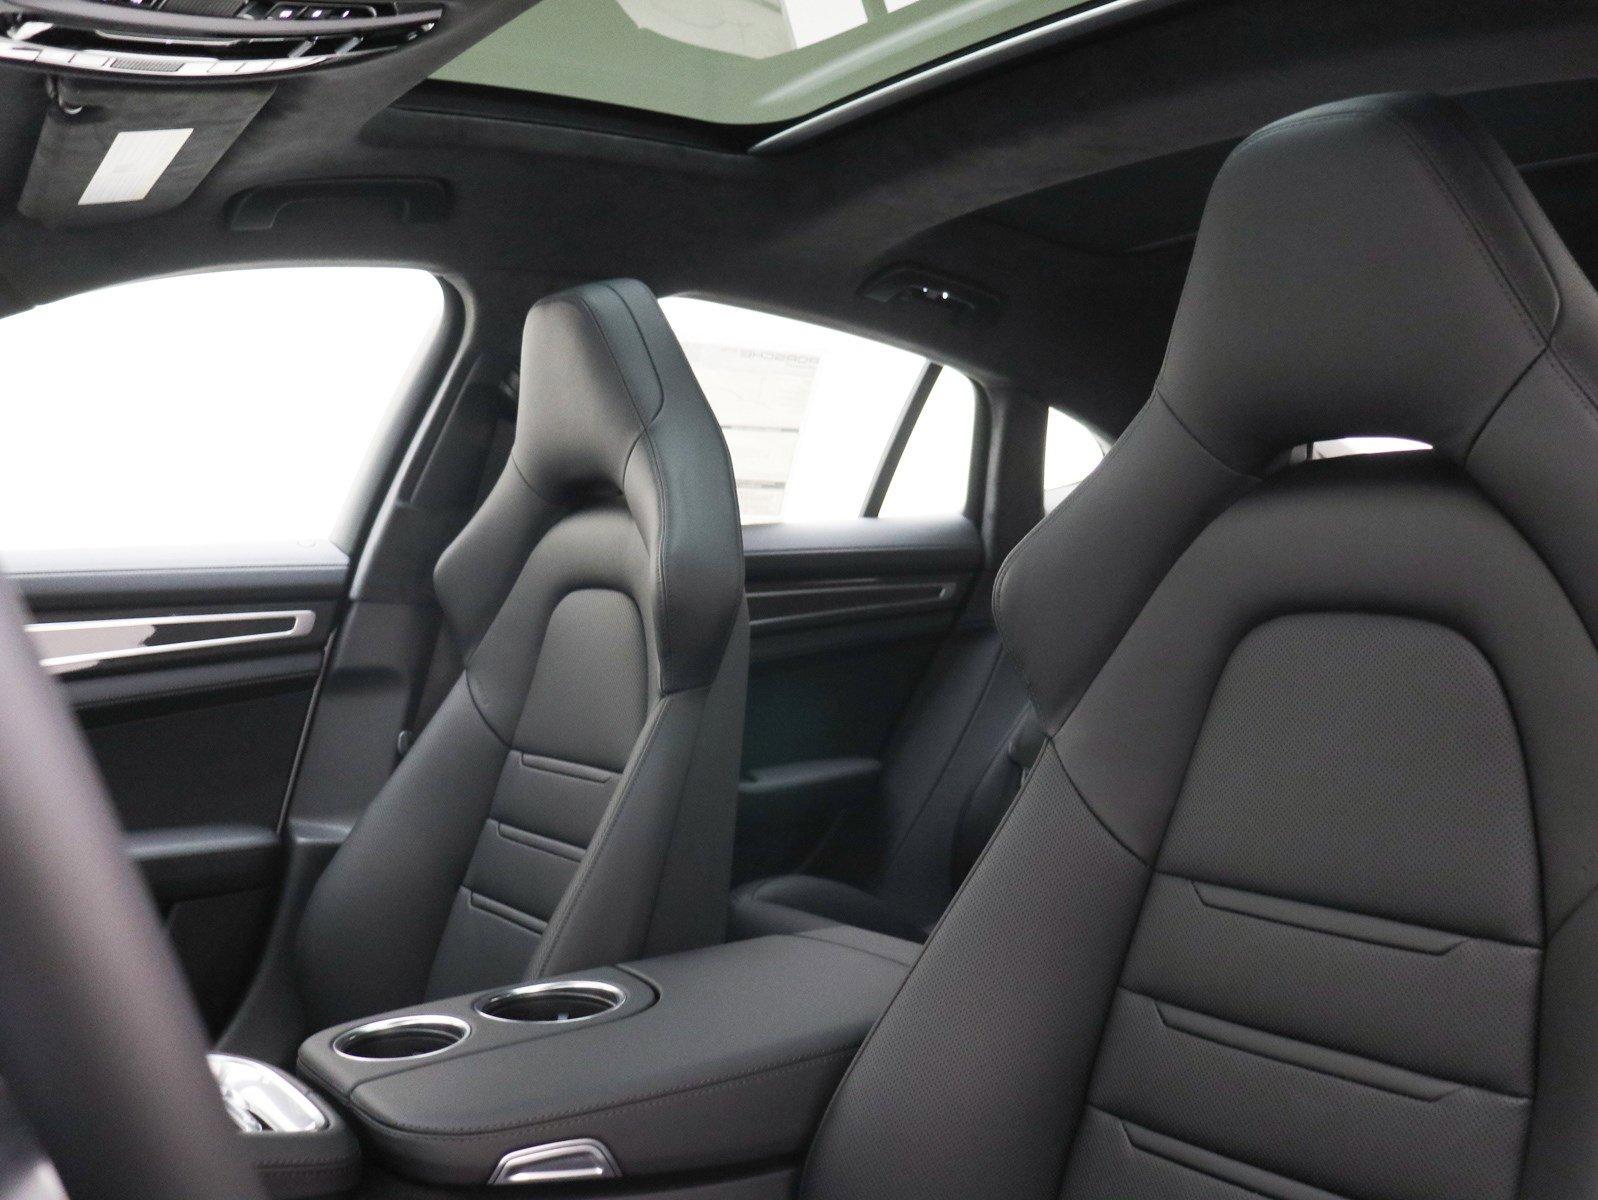 New 2020 Porsche Panamera GTS